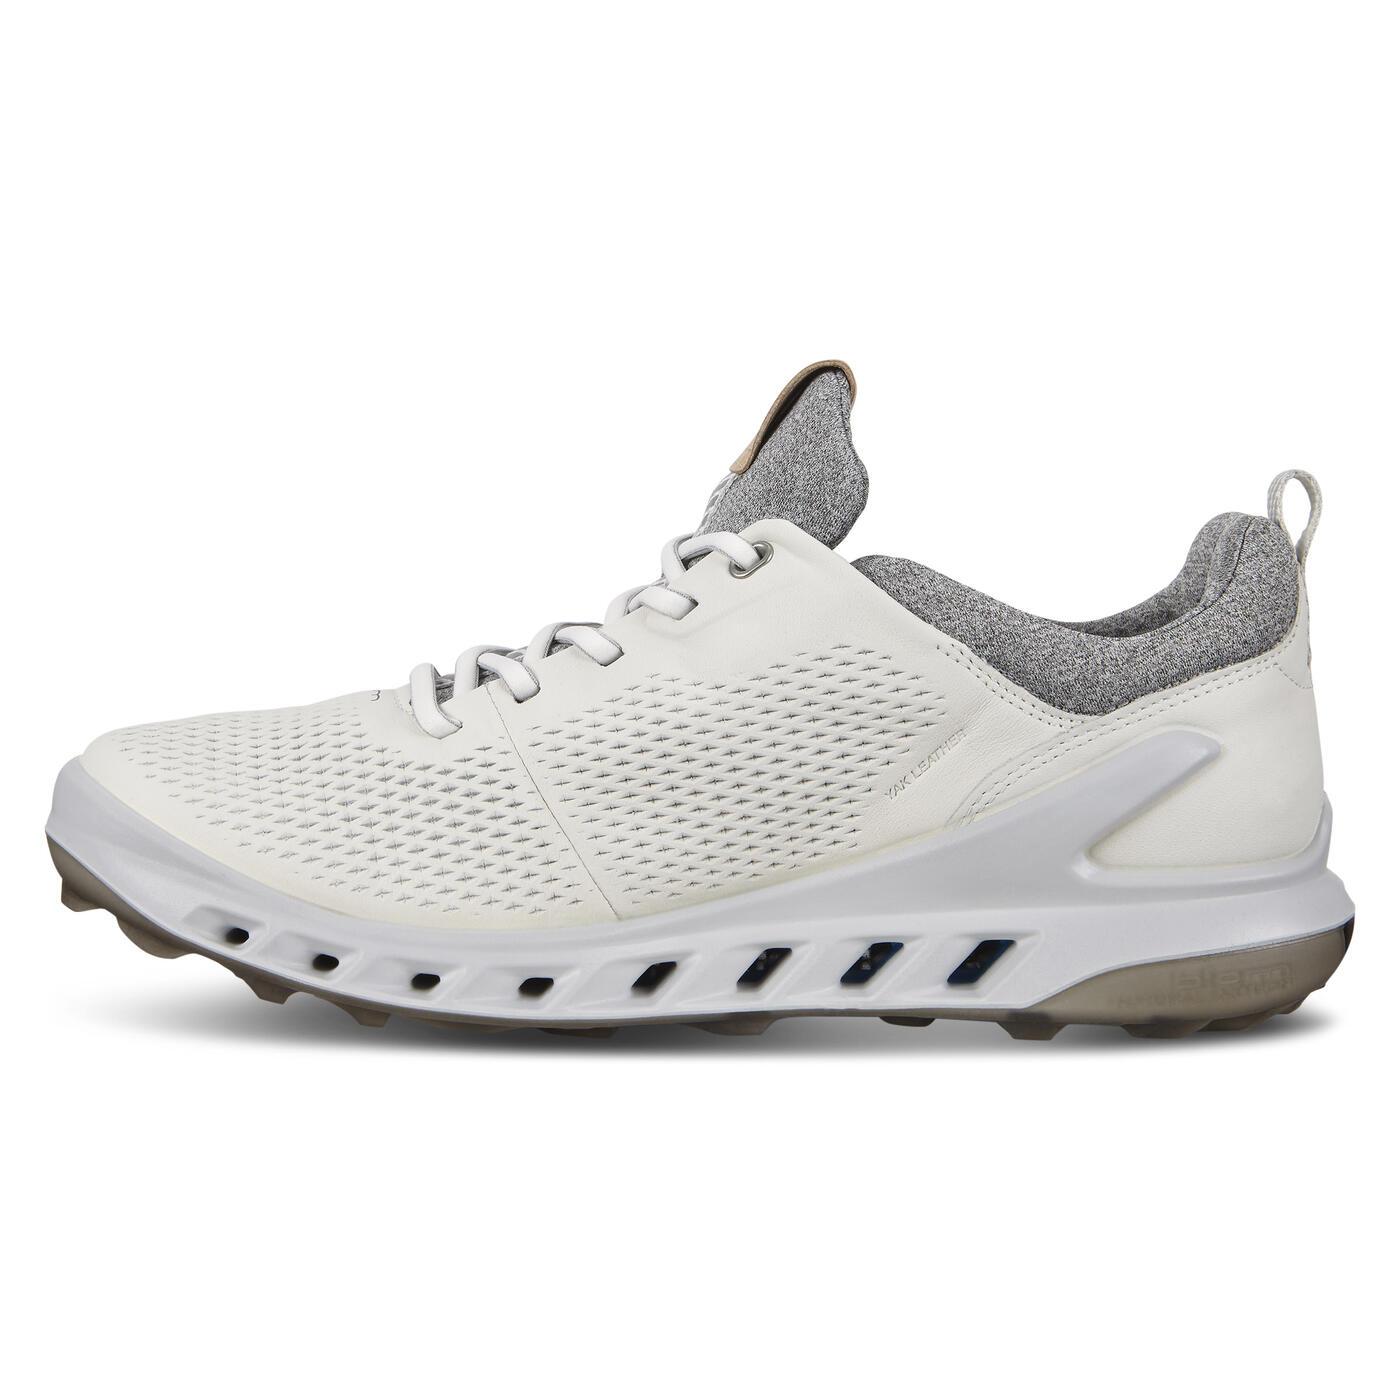 ECCO M GOLF BIOM COOL PRO Shoe